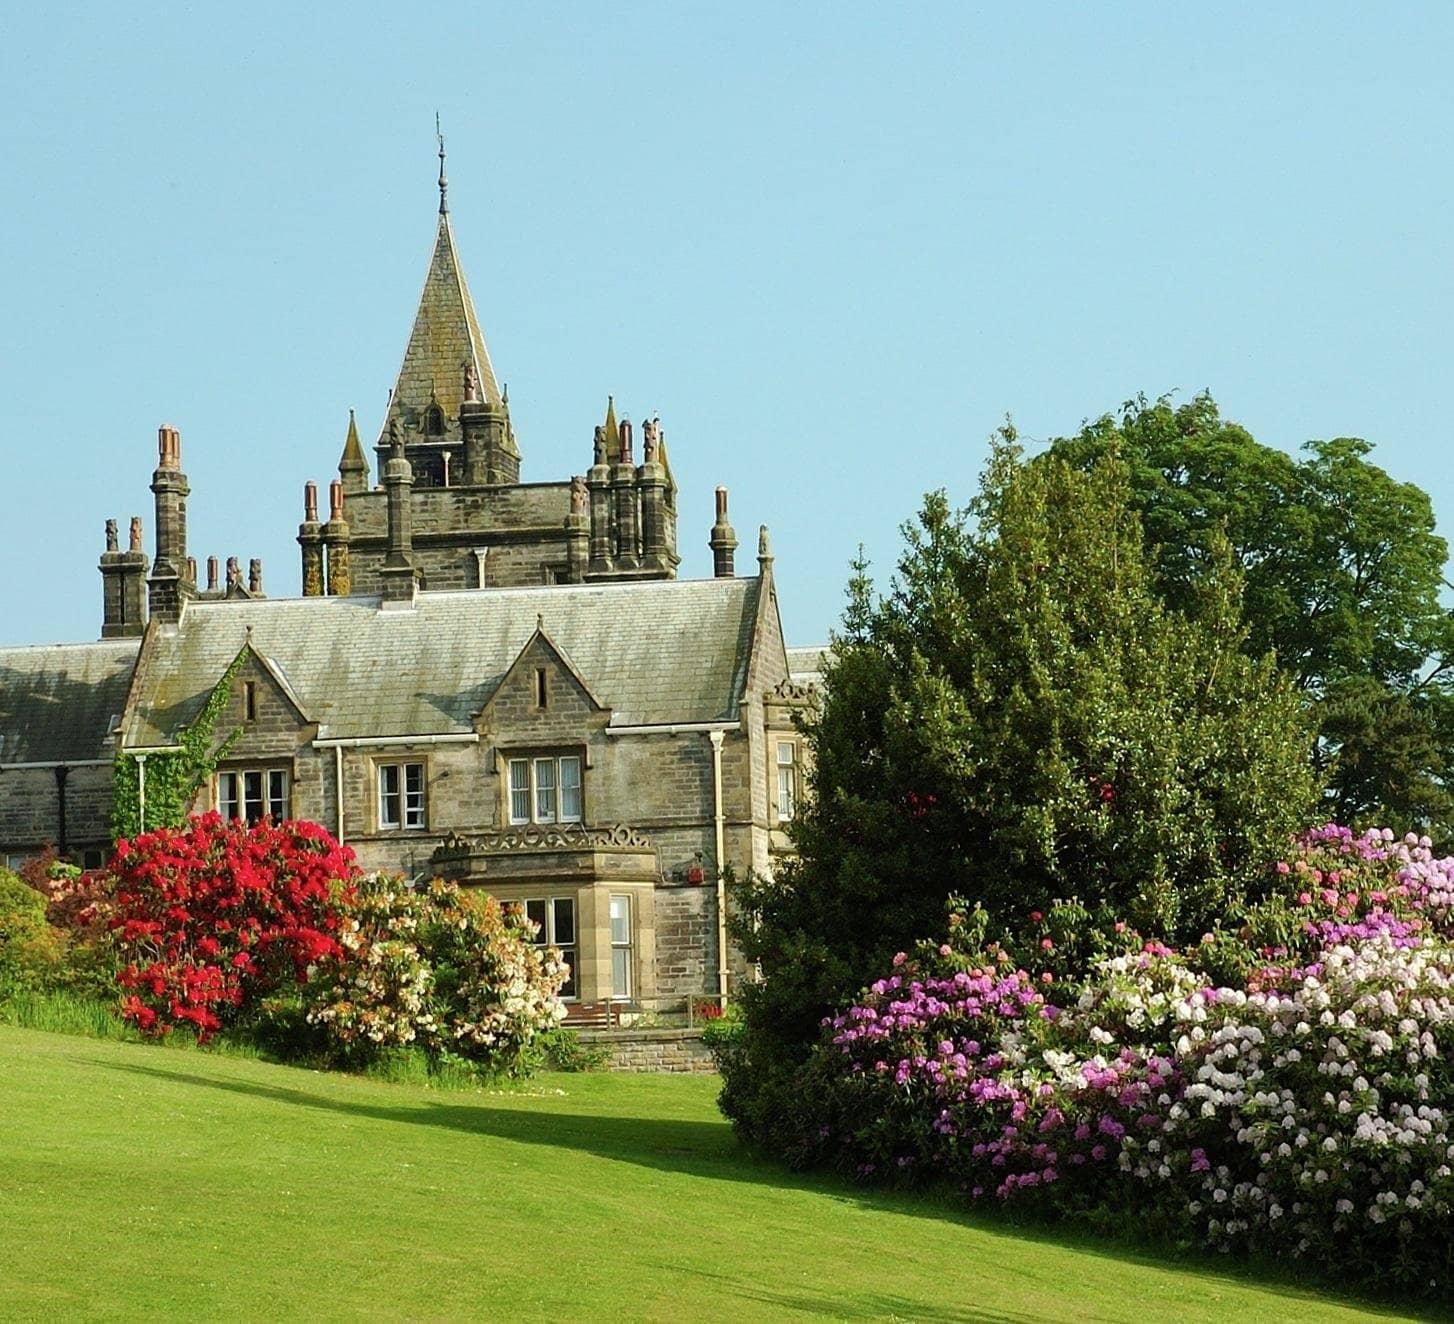 The Magic Tree Within Belmont Grosvenor School | Swarcliffe Hall, Harrogate HG3 2JG | +44 1423 771029